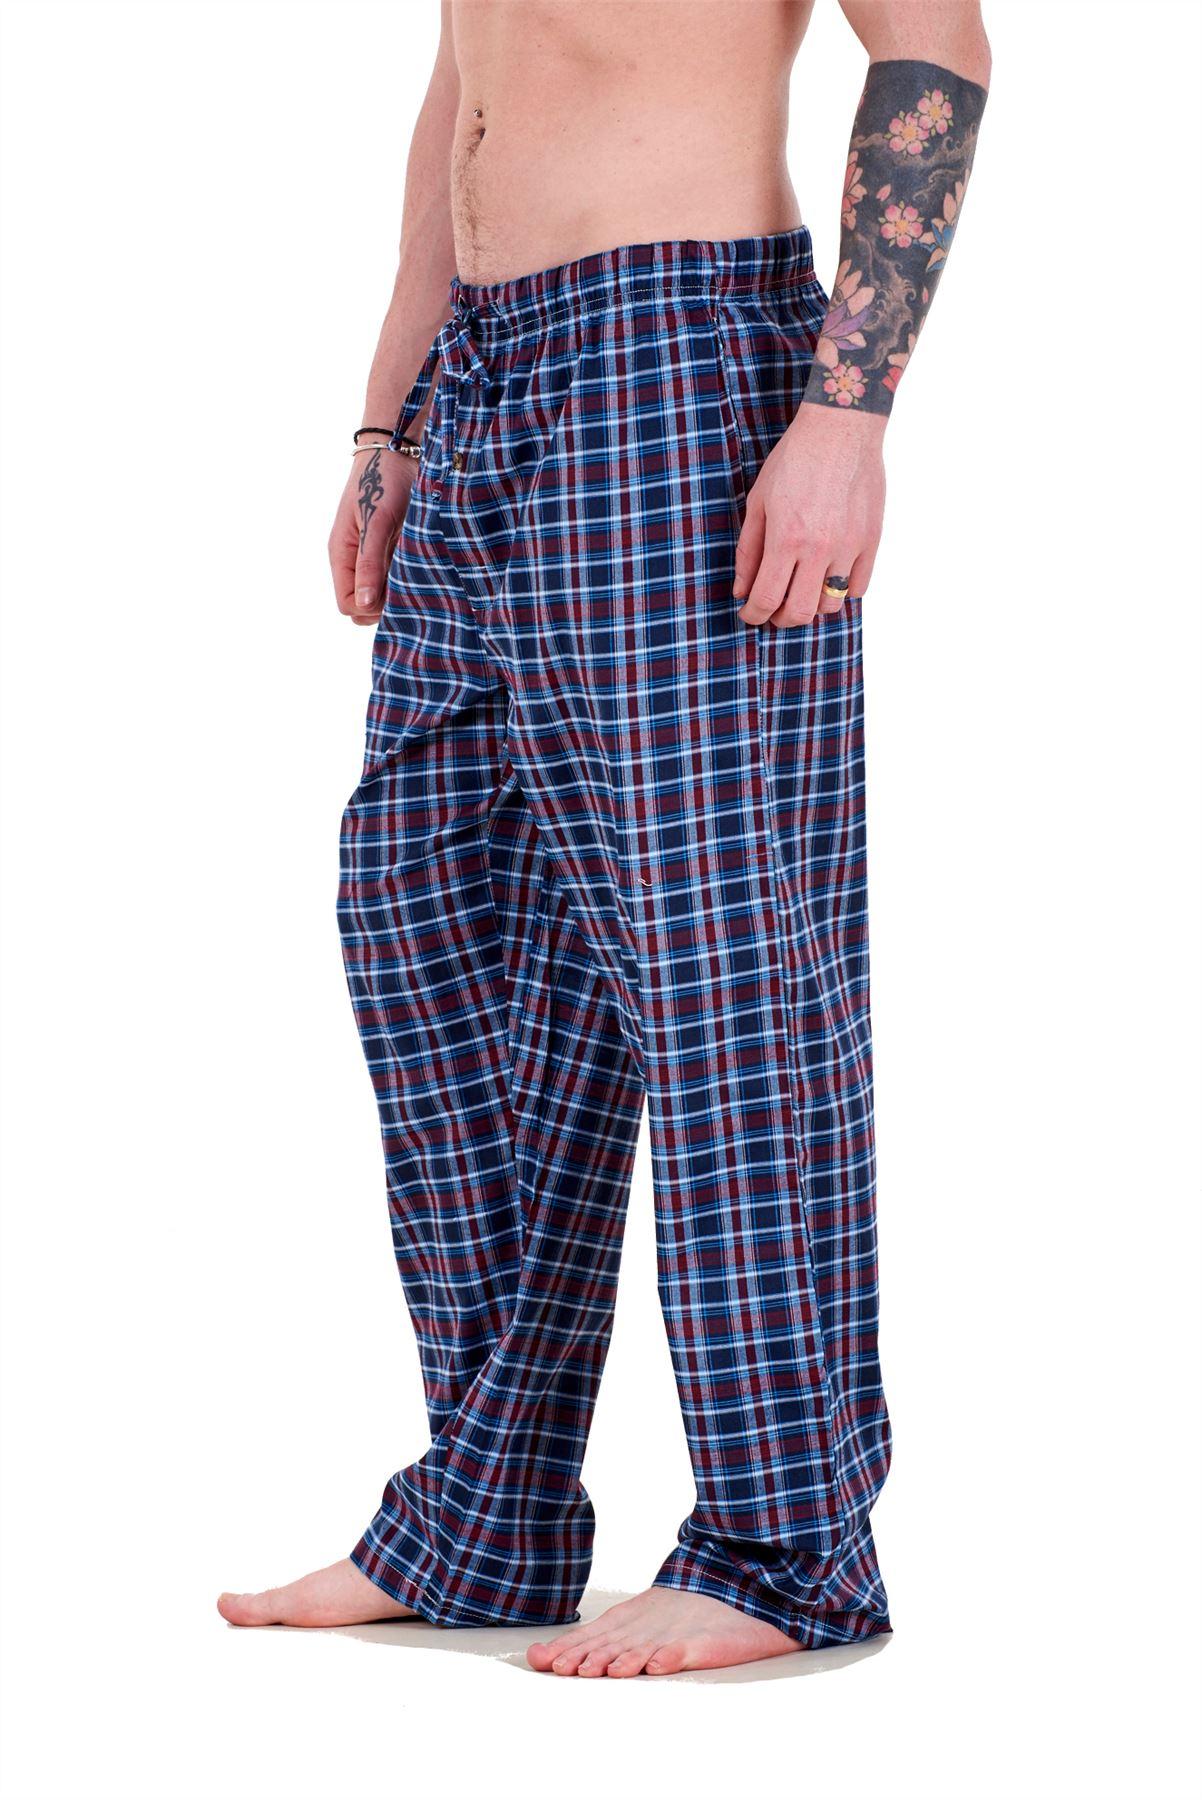 Mens-Pyjama-Bottoms-Rich-Cotton-Woven-Check-Lounge-Pant-Nightwear-Big-3XL-to-5XL Indexbild 54